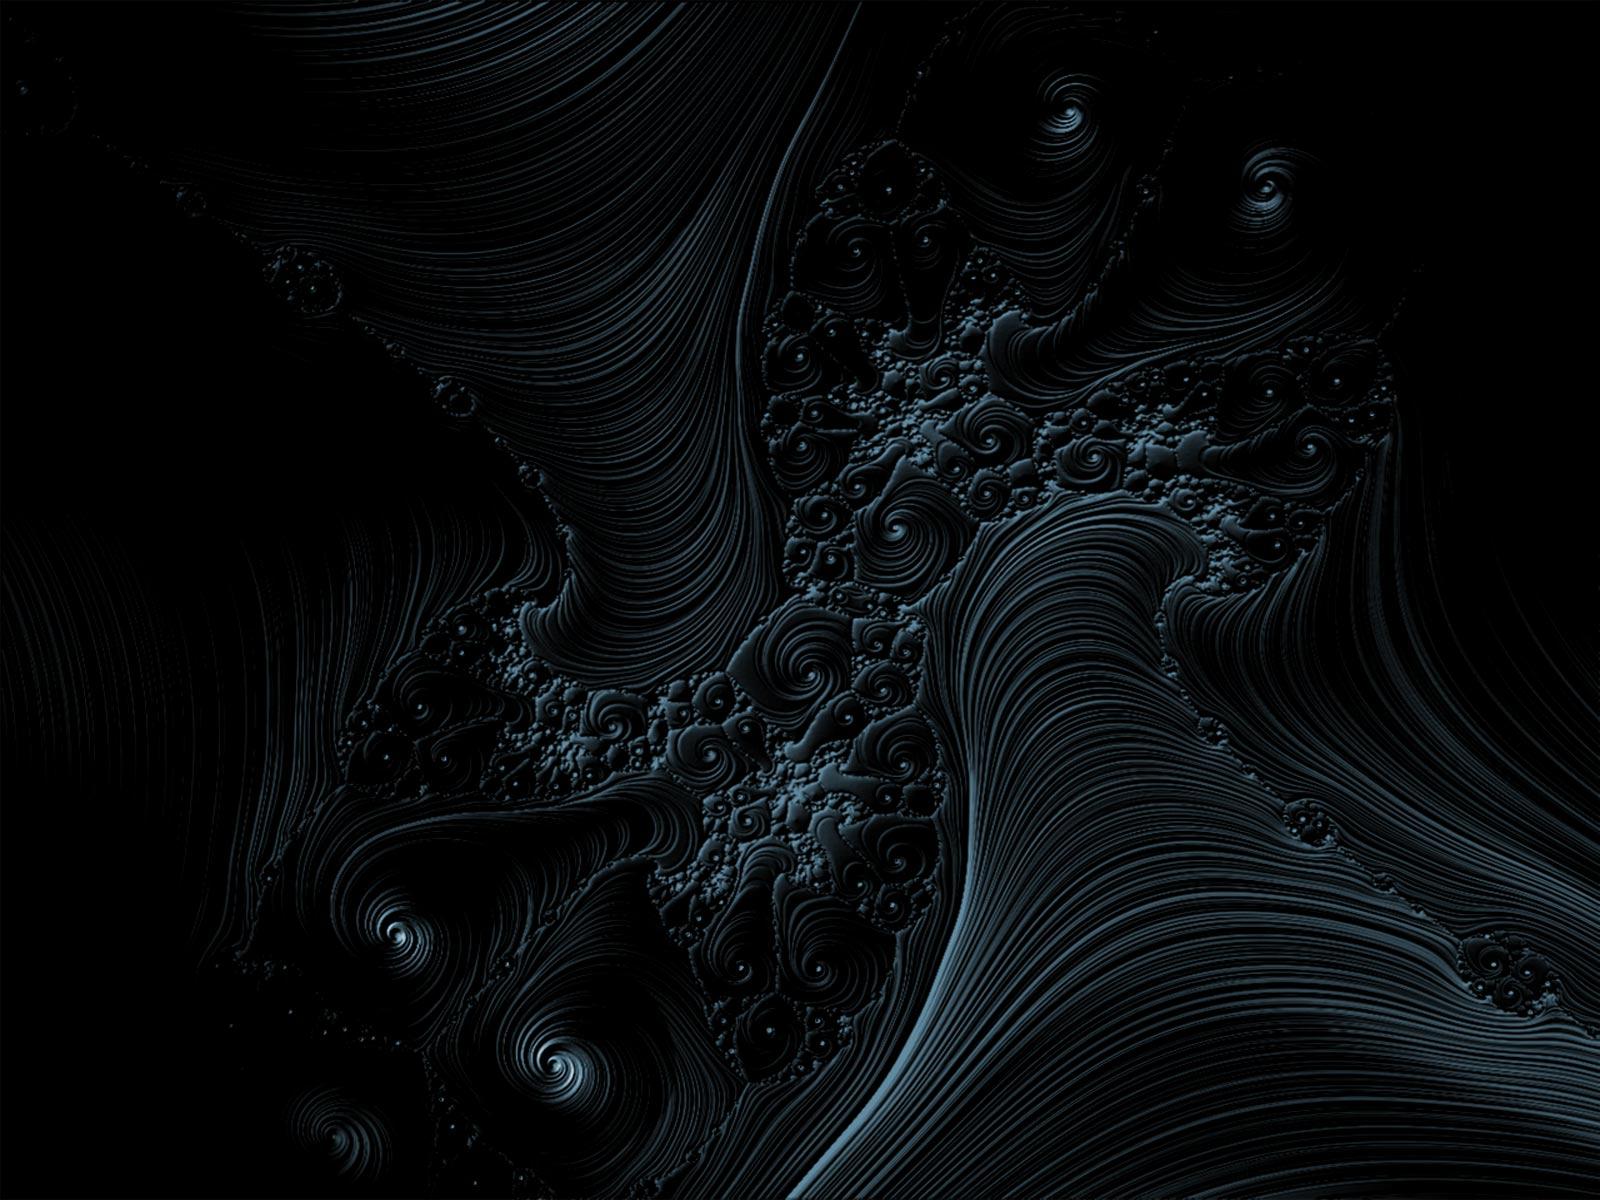 Black Epreet Cool Black Wallpapers 1600x1200